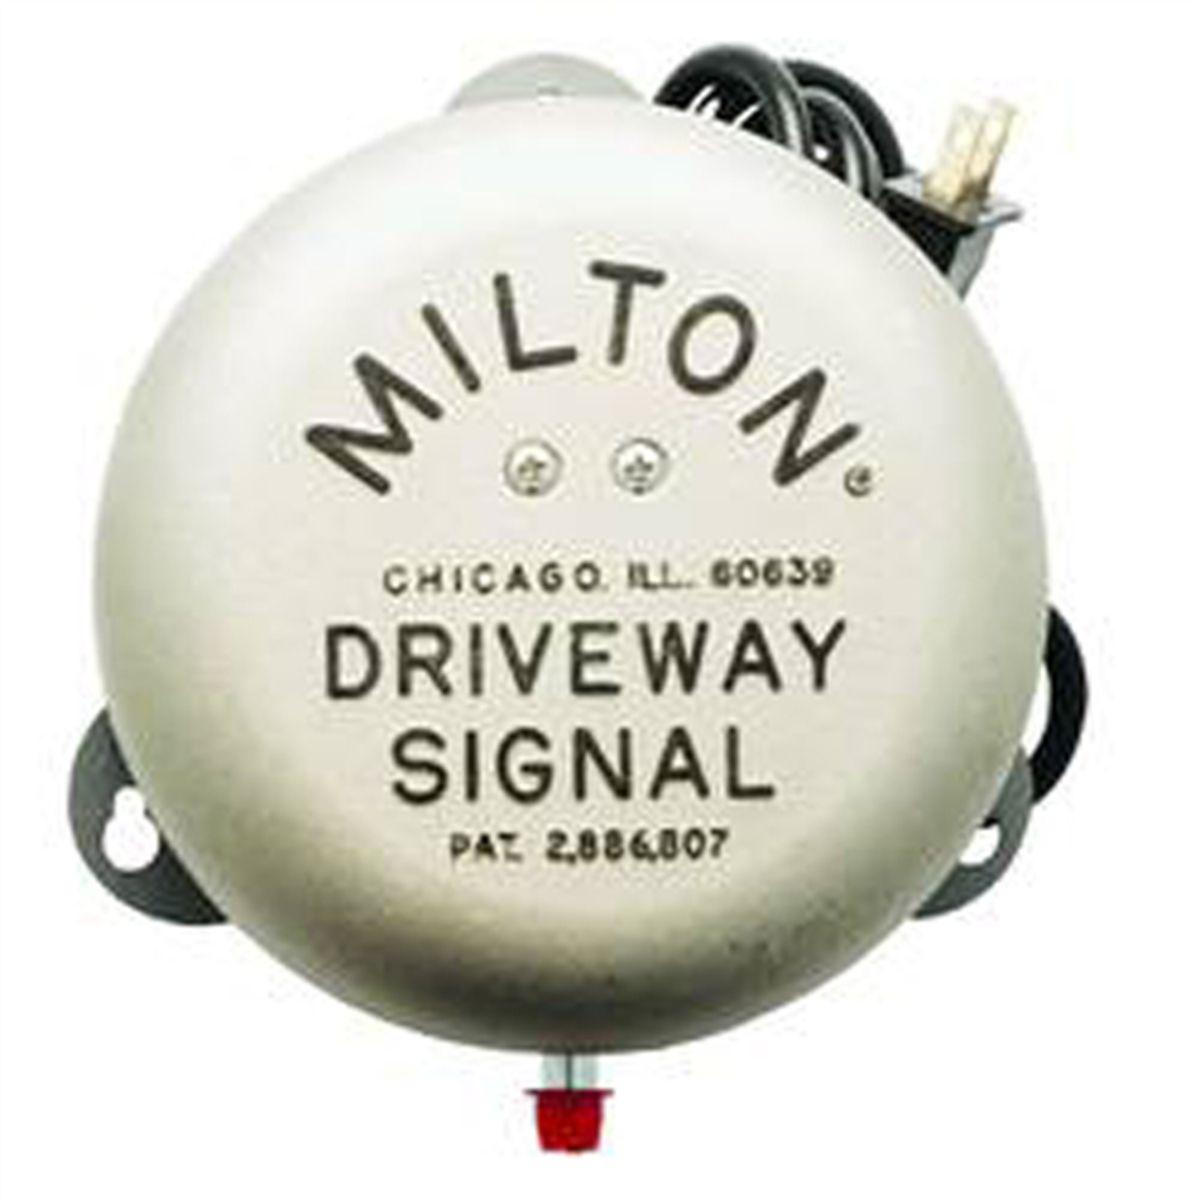 Automotive Tools & Supplies Driveway Signal Bell MIL805 Brand New! Automotive